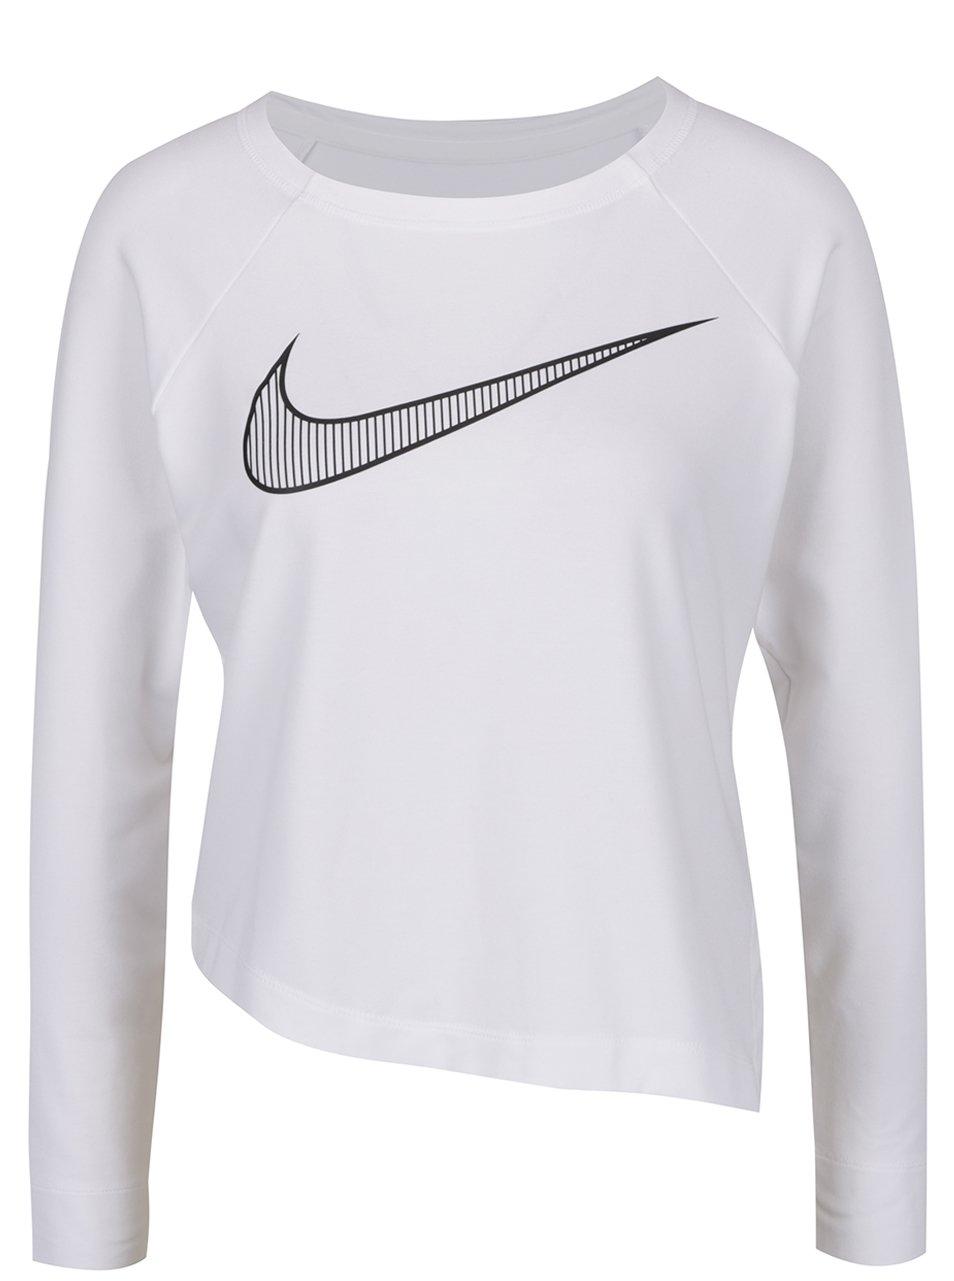 Bílé asymetrické tričko s dlouhým rukávem a potiskem Nike